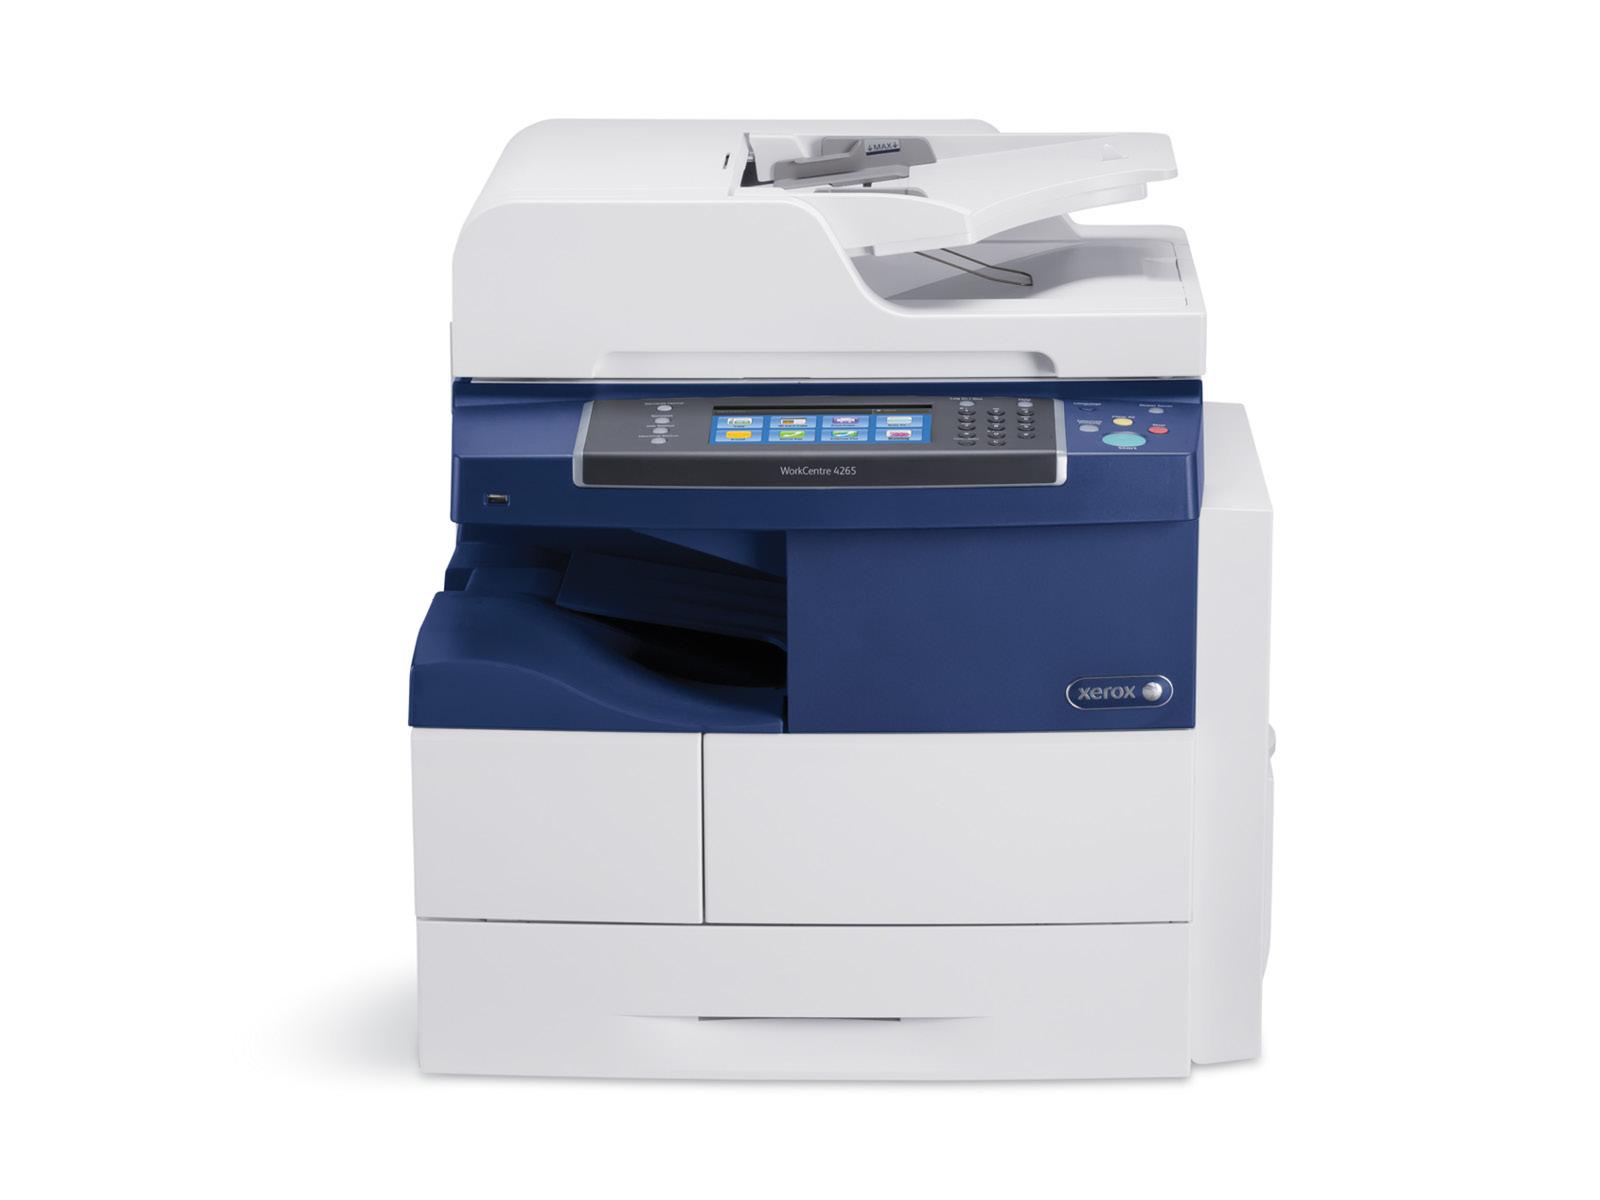 Xerox WorkCentre 4265 - Document Network Services Ltd